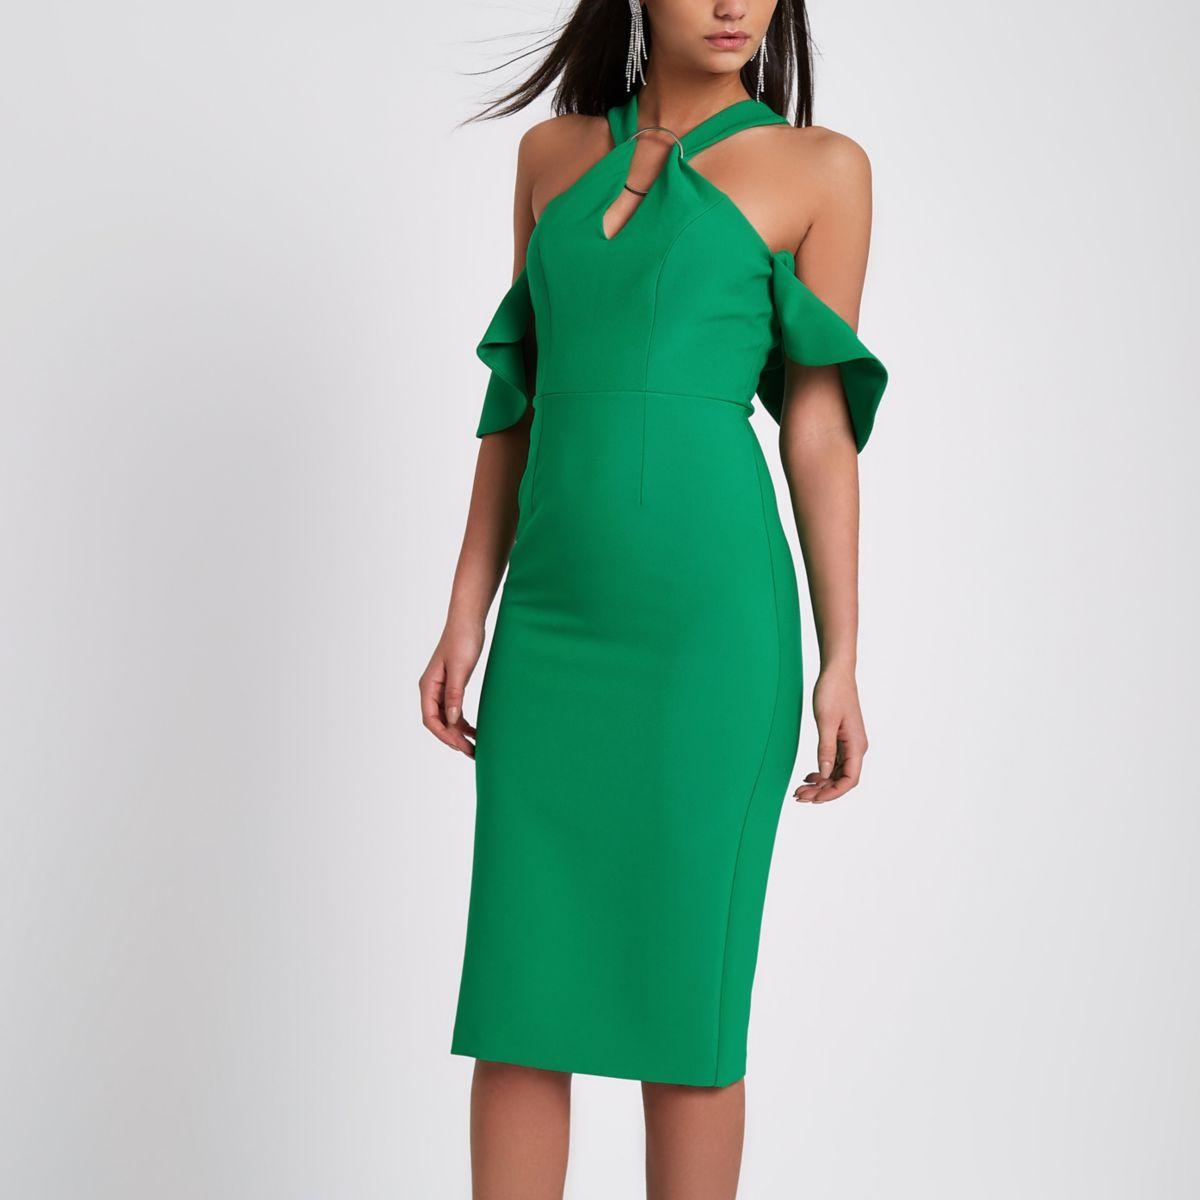 Green ring front bodycon midi dress